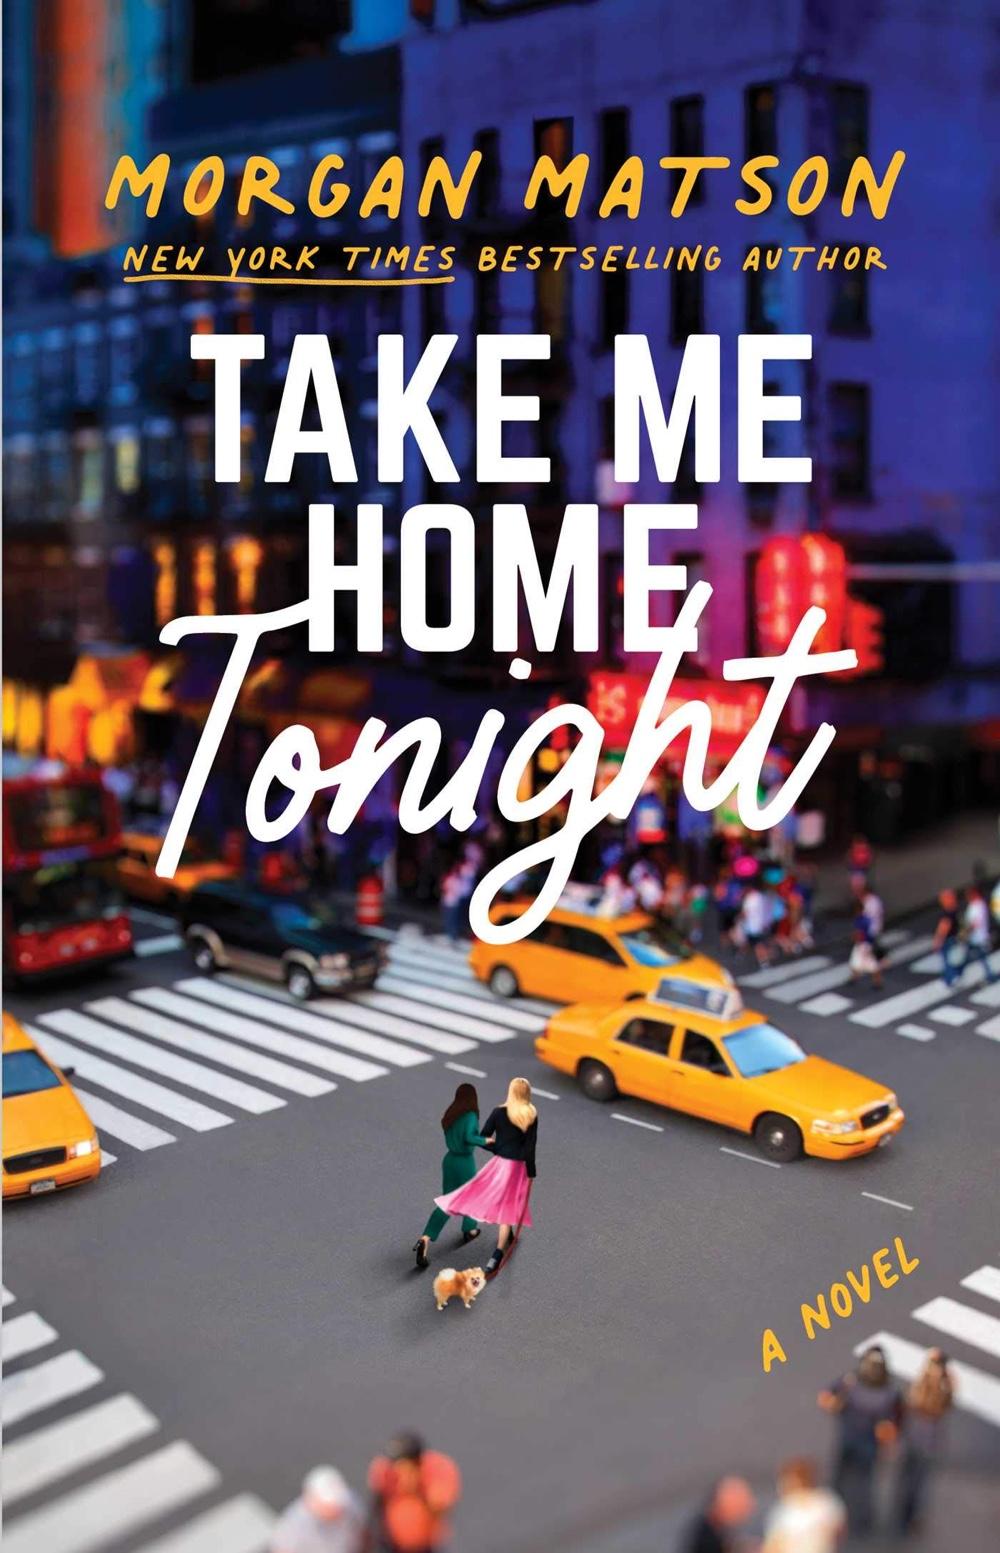 Take Me Home Tonight by Morgan Matson | Book Review